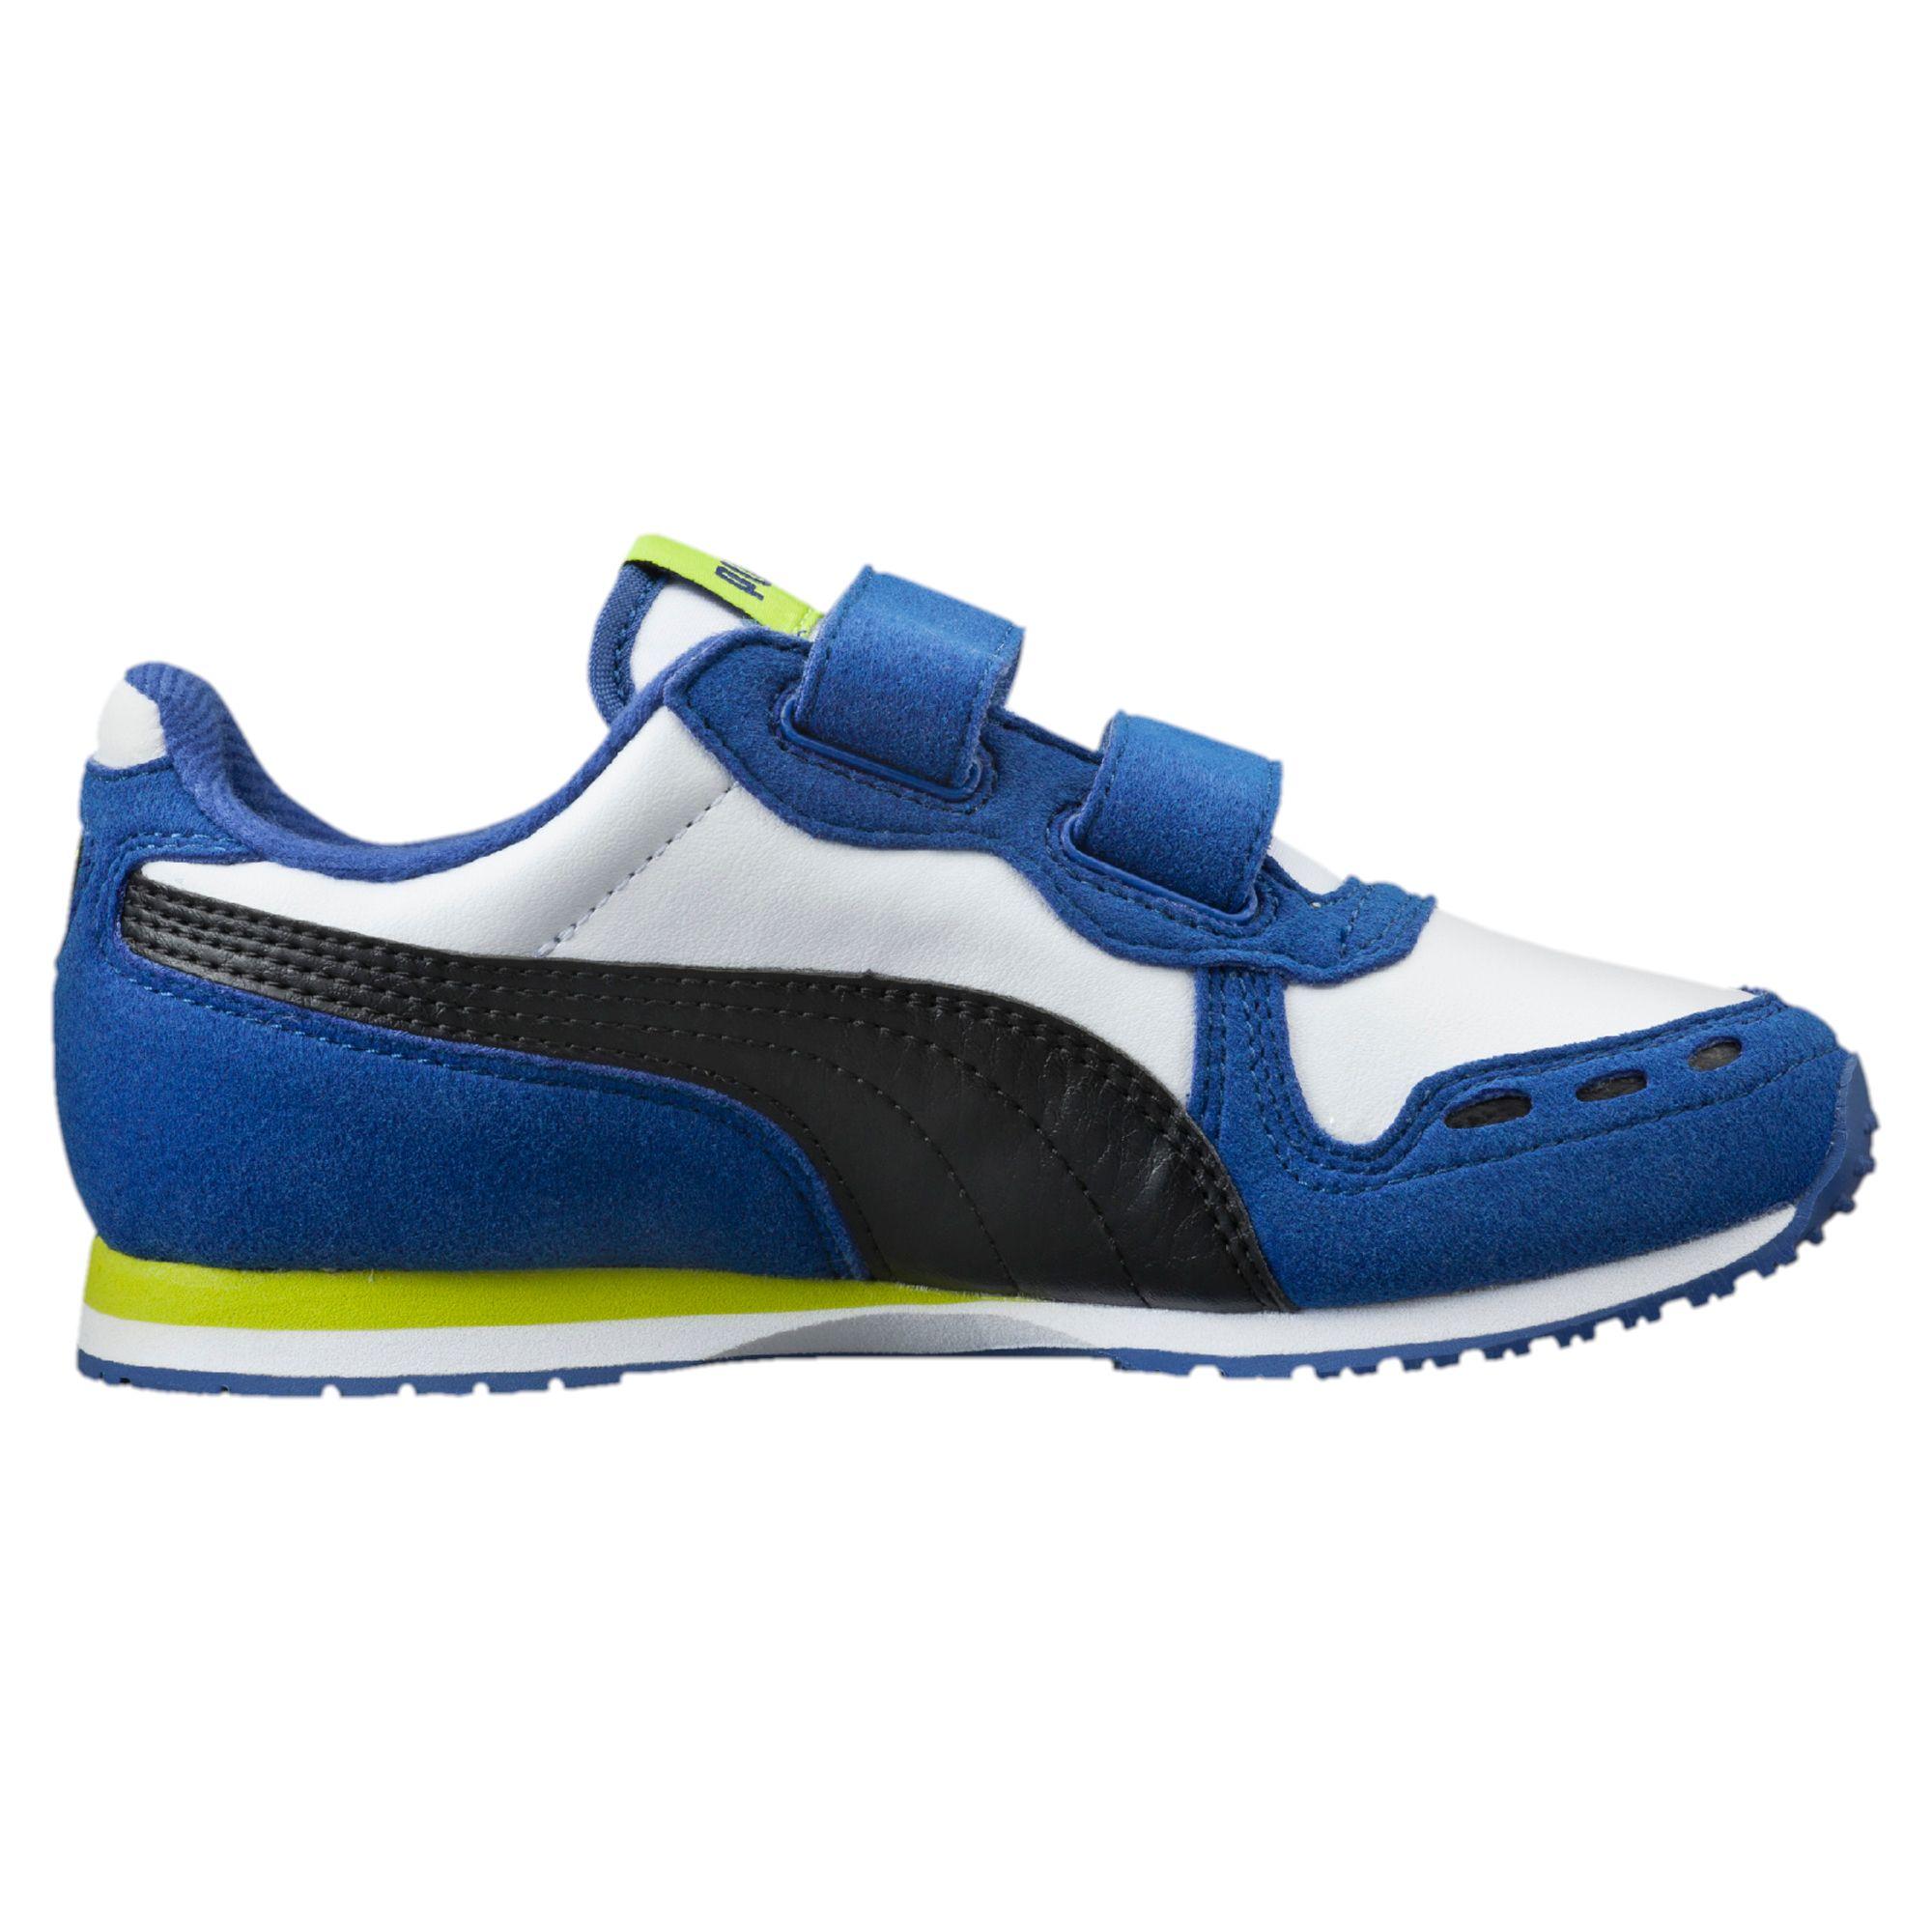 Pumas Cabana Coureur Sneaker V Ps Sl Enfants Unisexe - Blanc - 31 Eu 4FcuW2CI9X